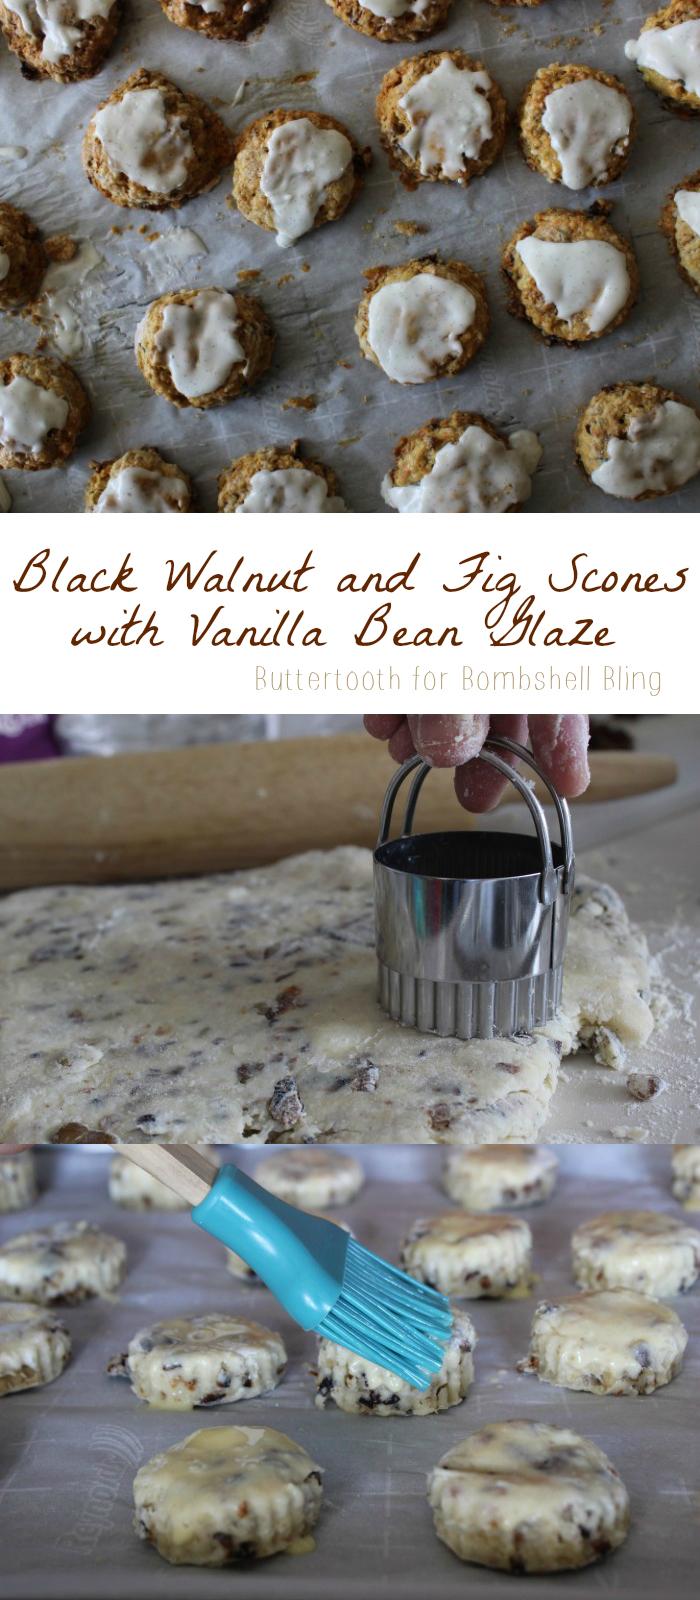 Black Walnut and Fig Scones with Vanilla Bean Glaze